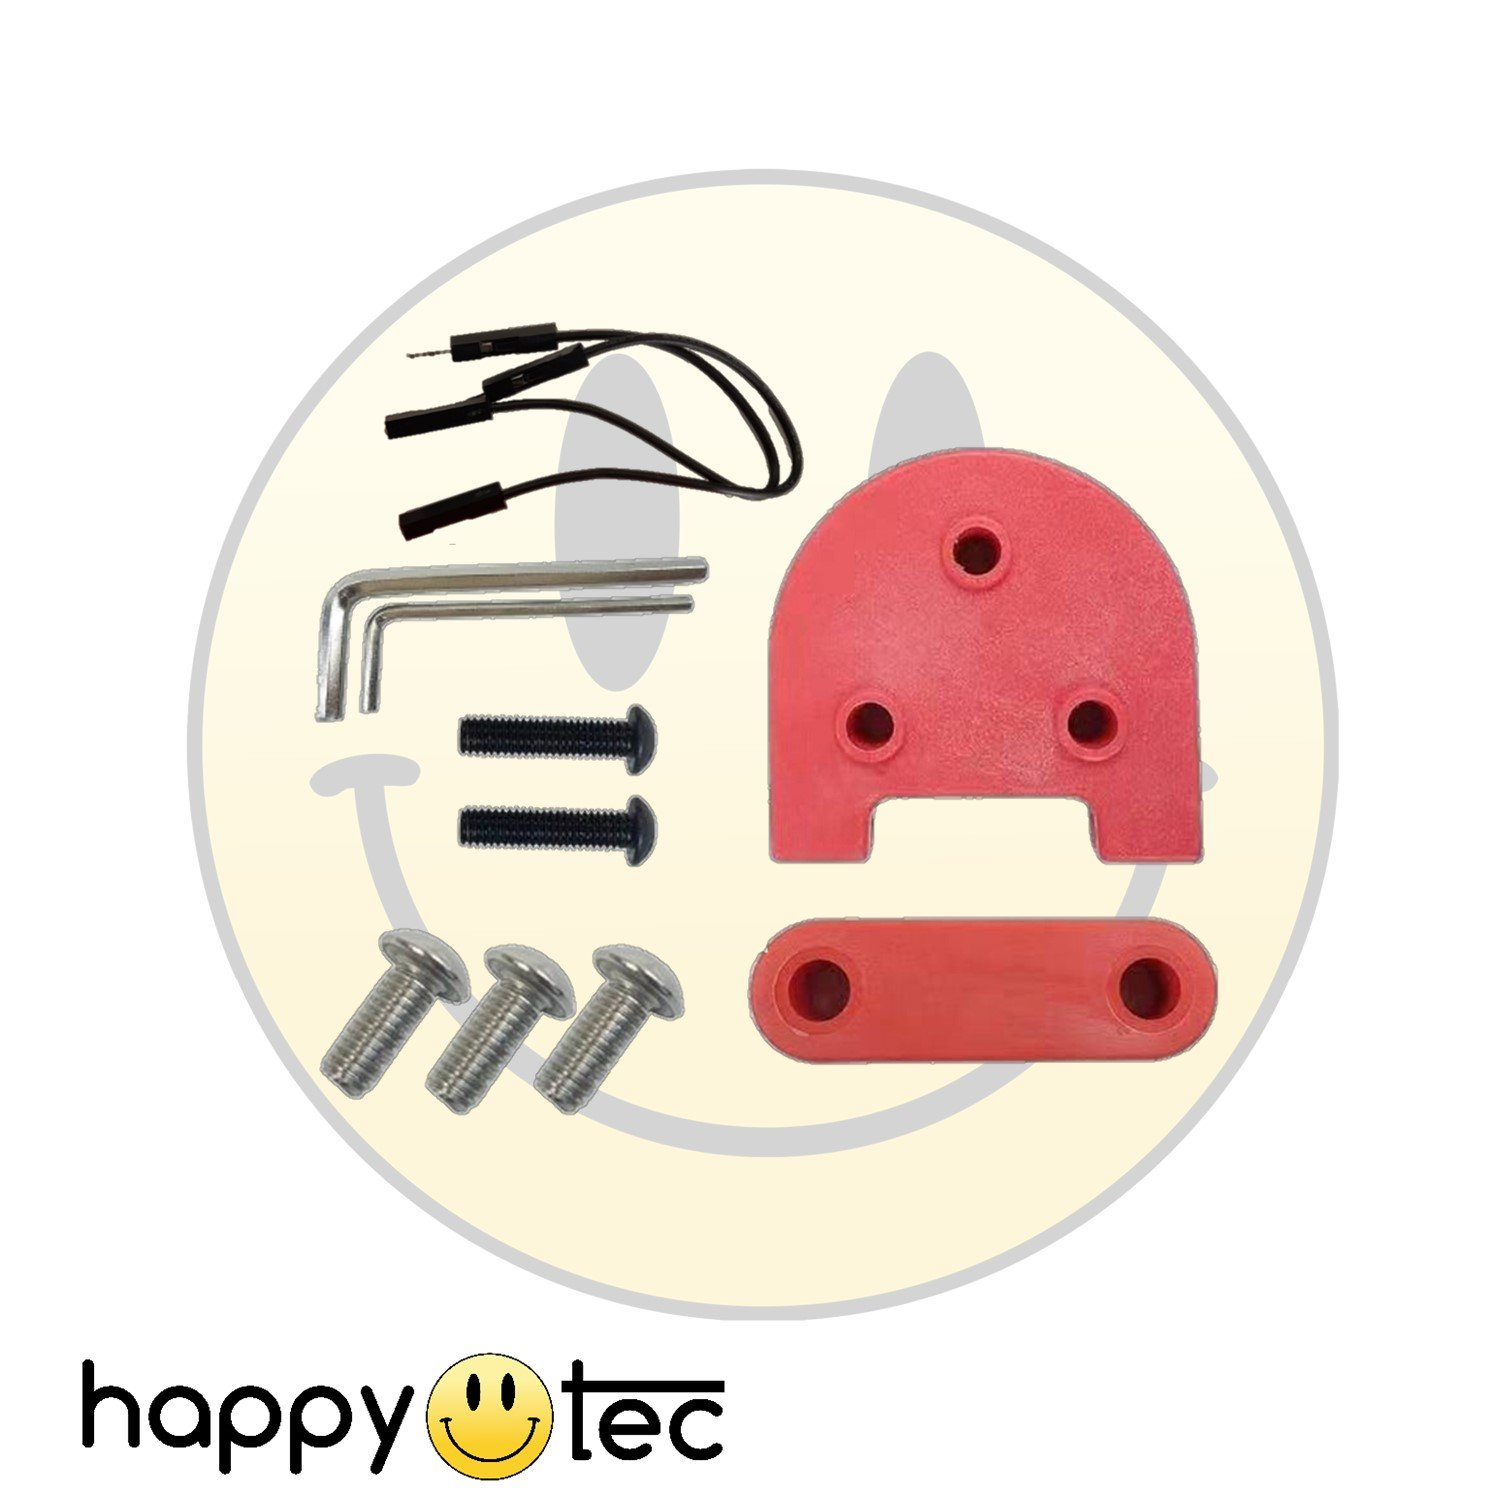 Accessori per Xiaomi | Spessori per installazione ruote 10